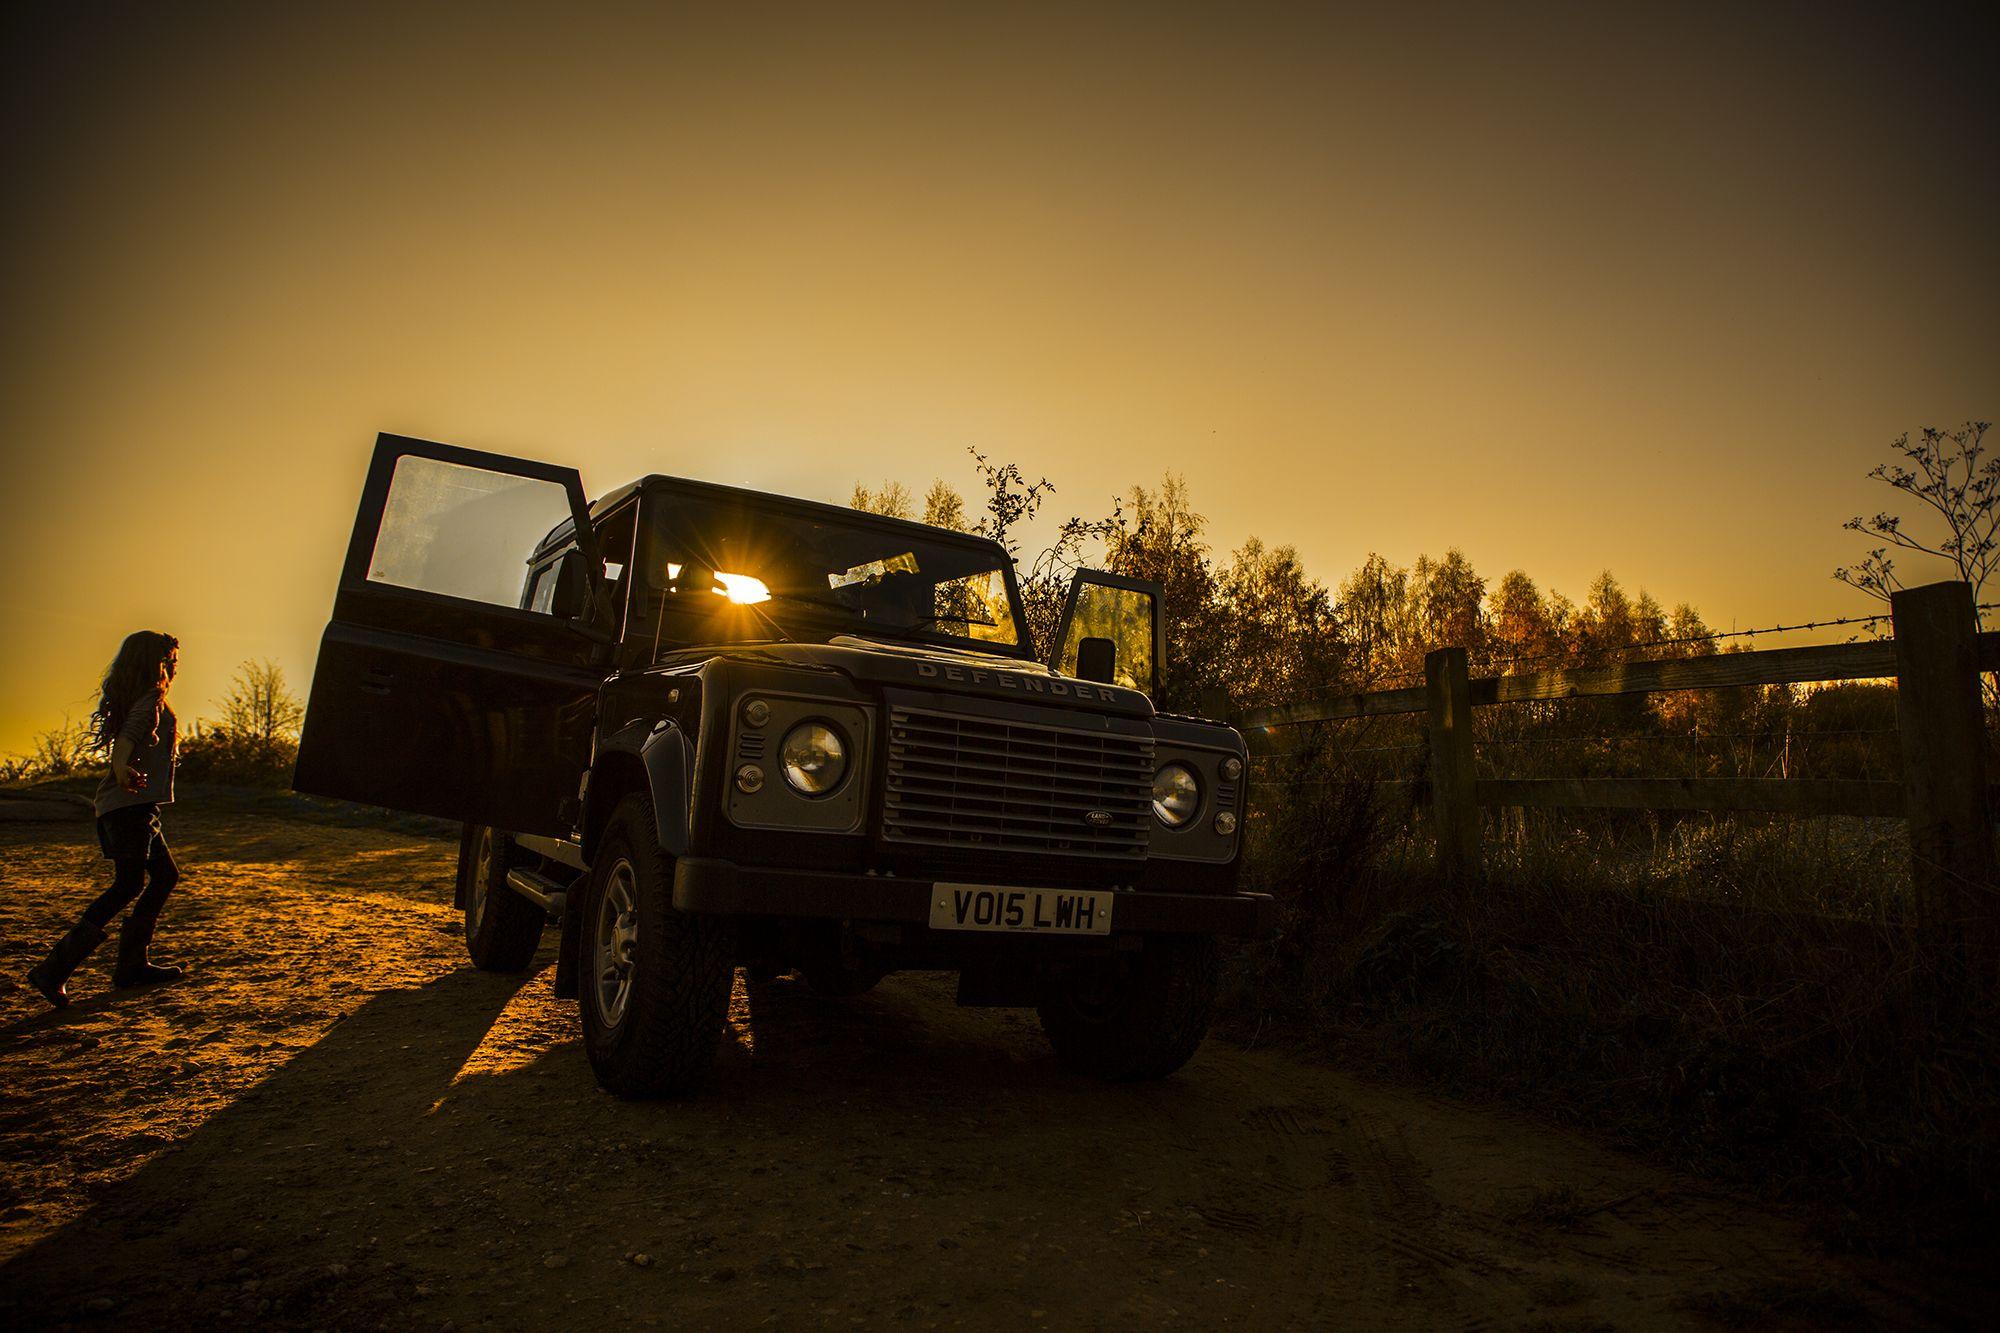 Land Rover Defender: sunset #landy #best4x4xfar #landroverdefender #4x4life #offroading #outdoor #roadtrip #expedition #4wd #sunset